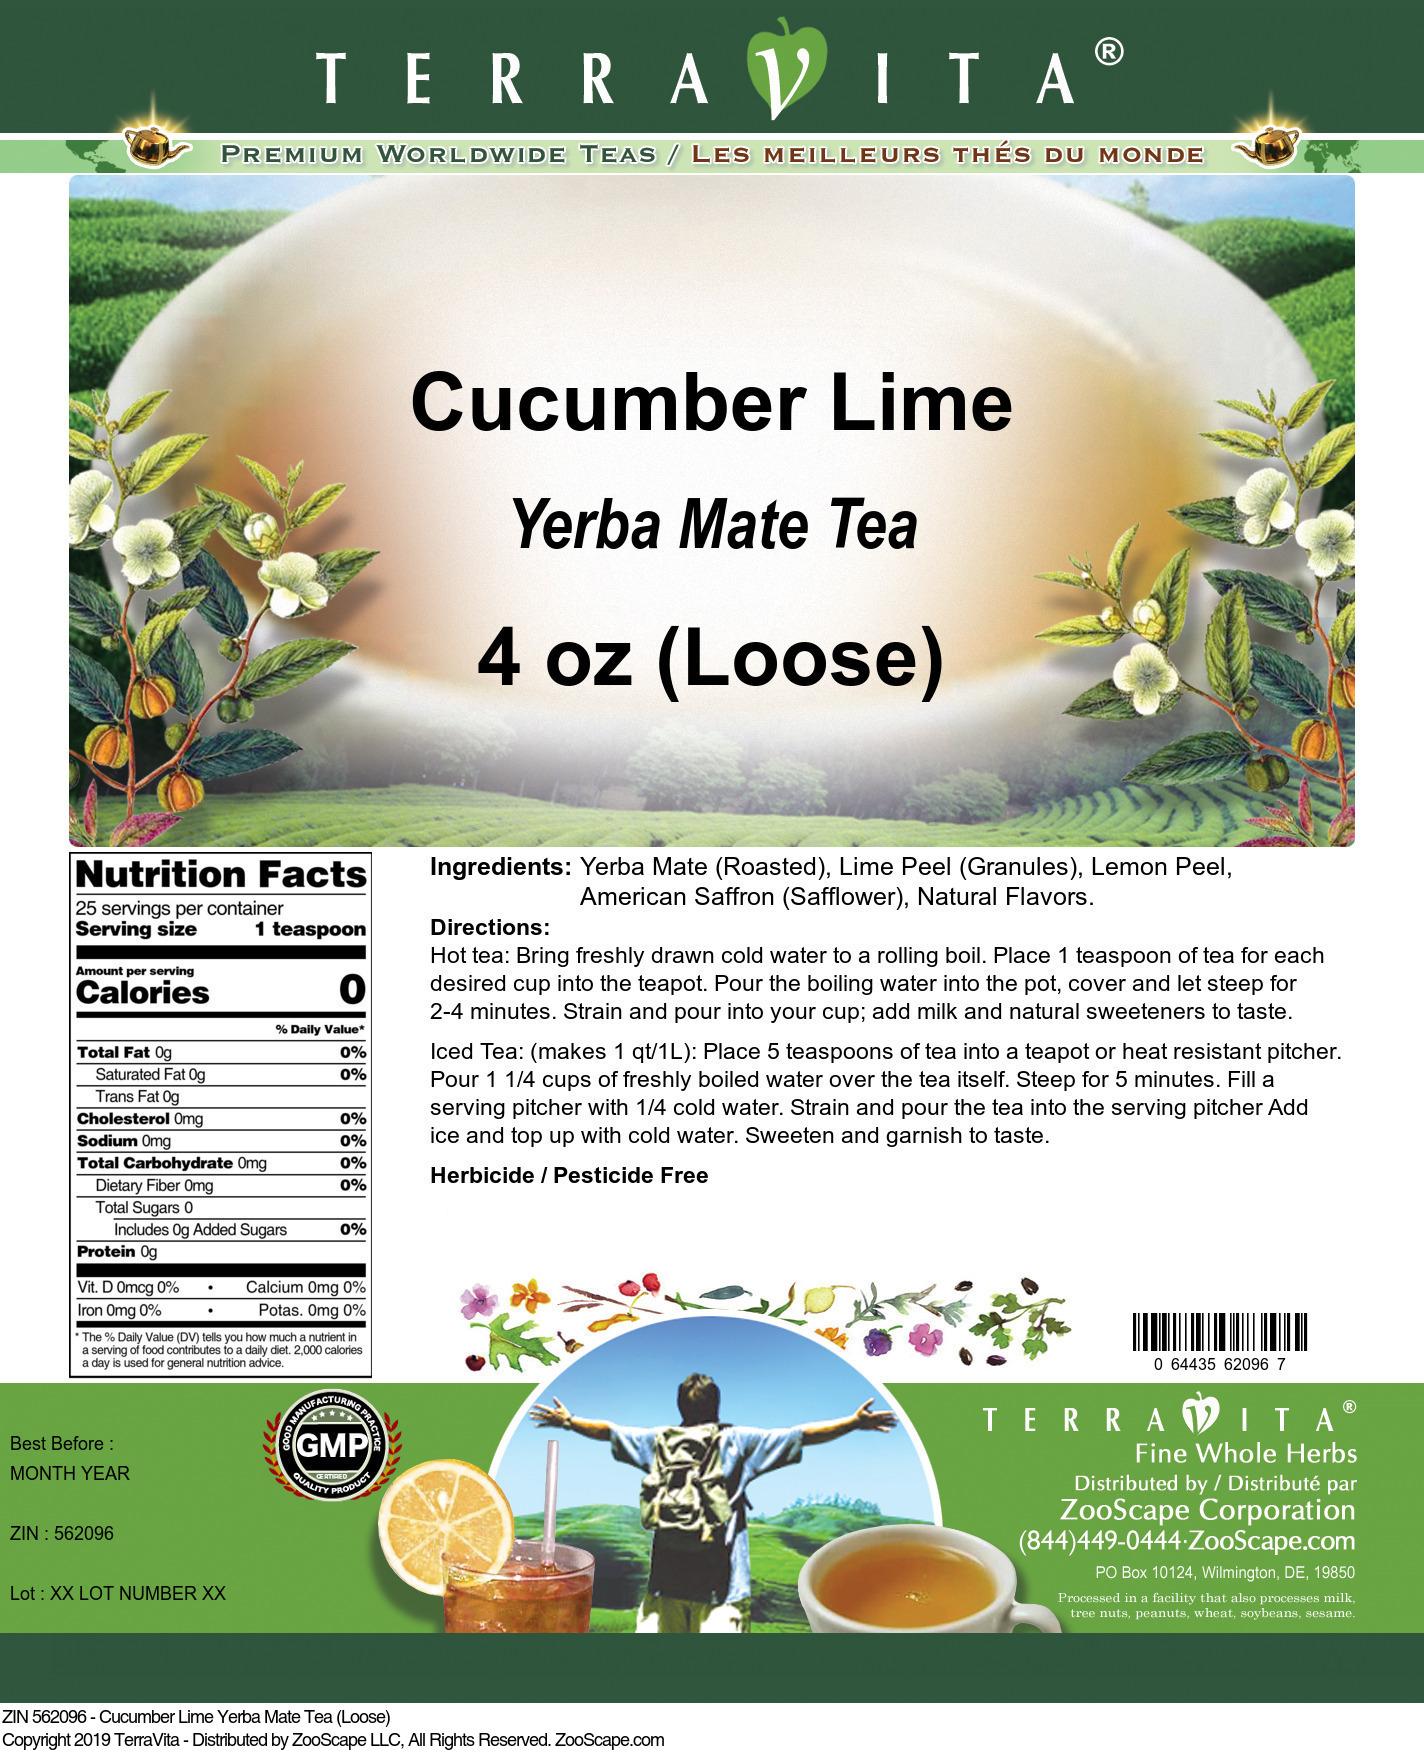 Cucumber Lime Yerba Mate Tea (Loose)